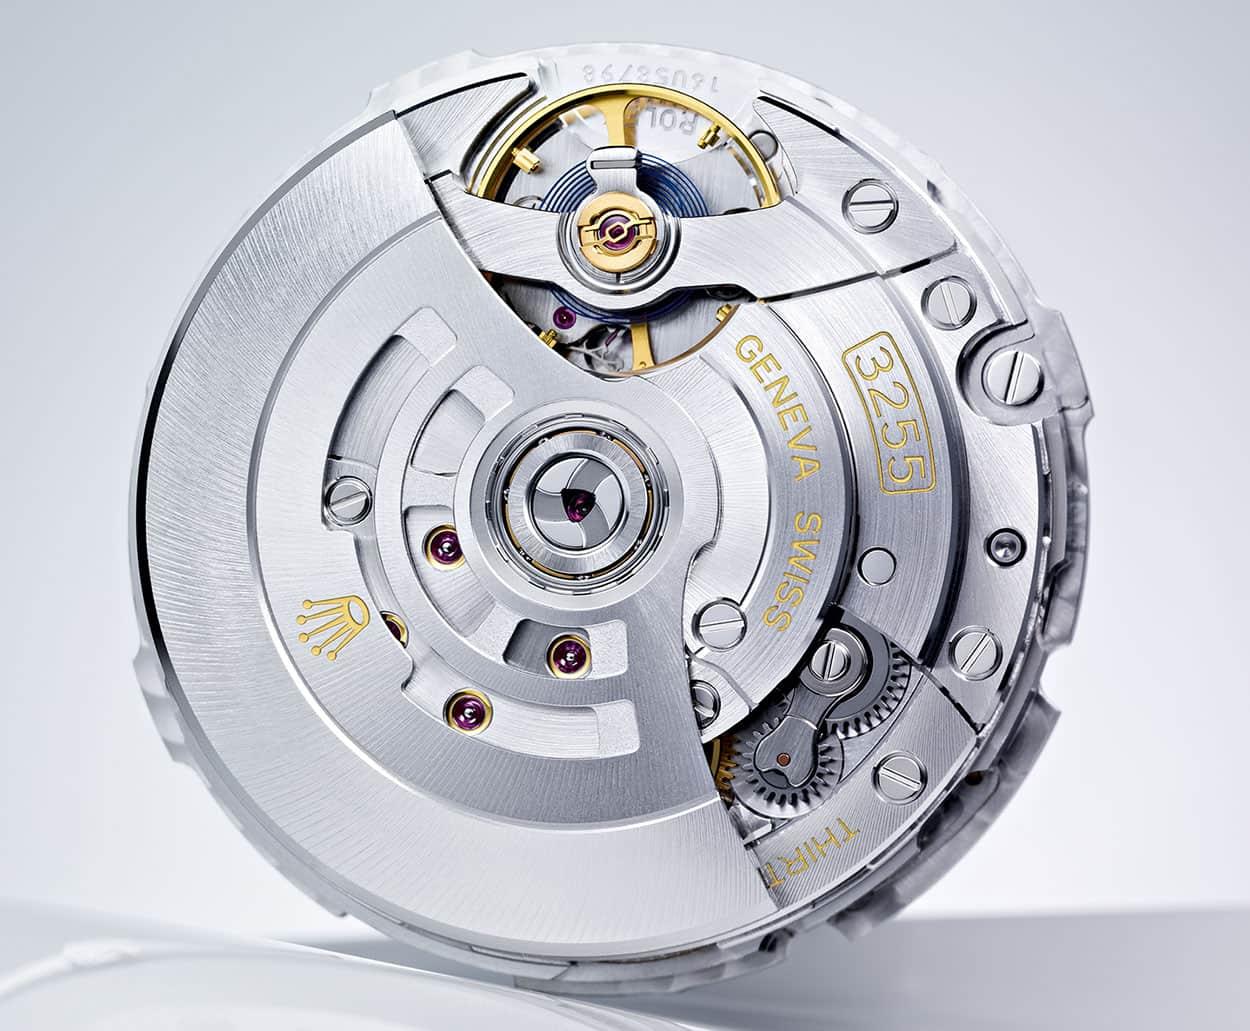 RolexCaliber3255movement